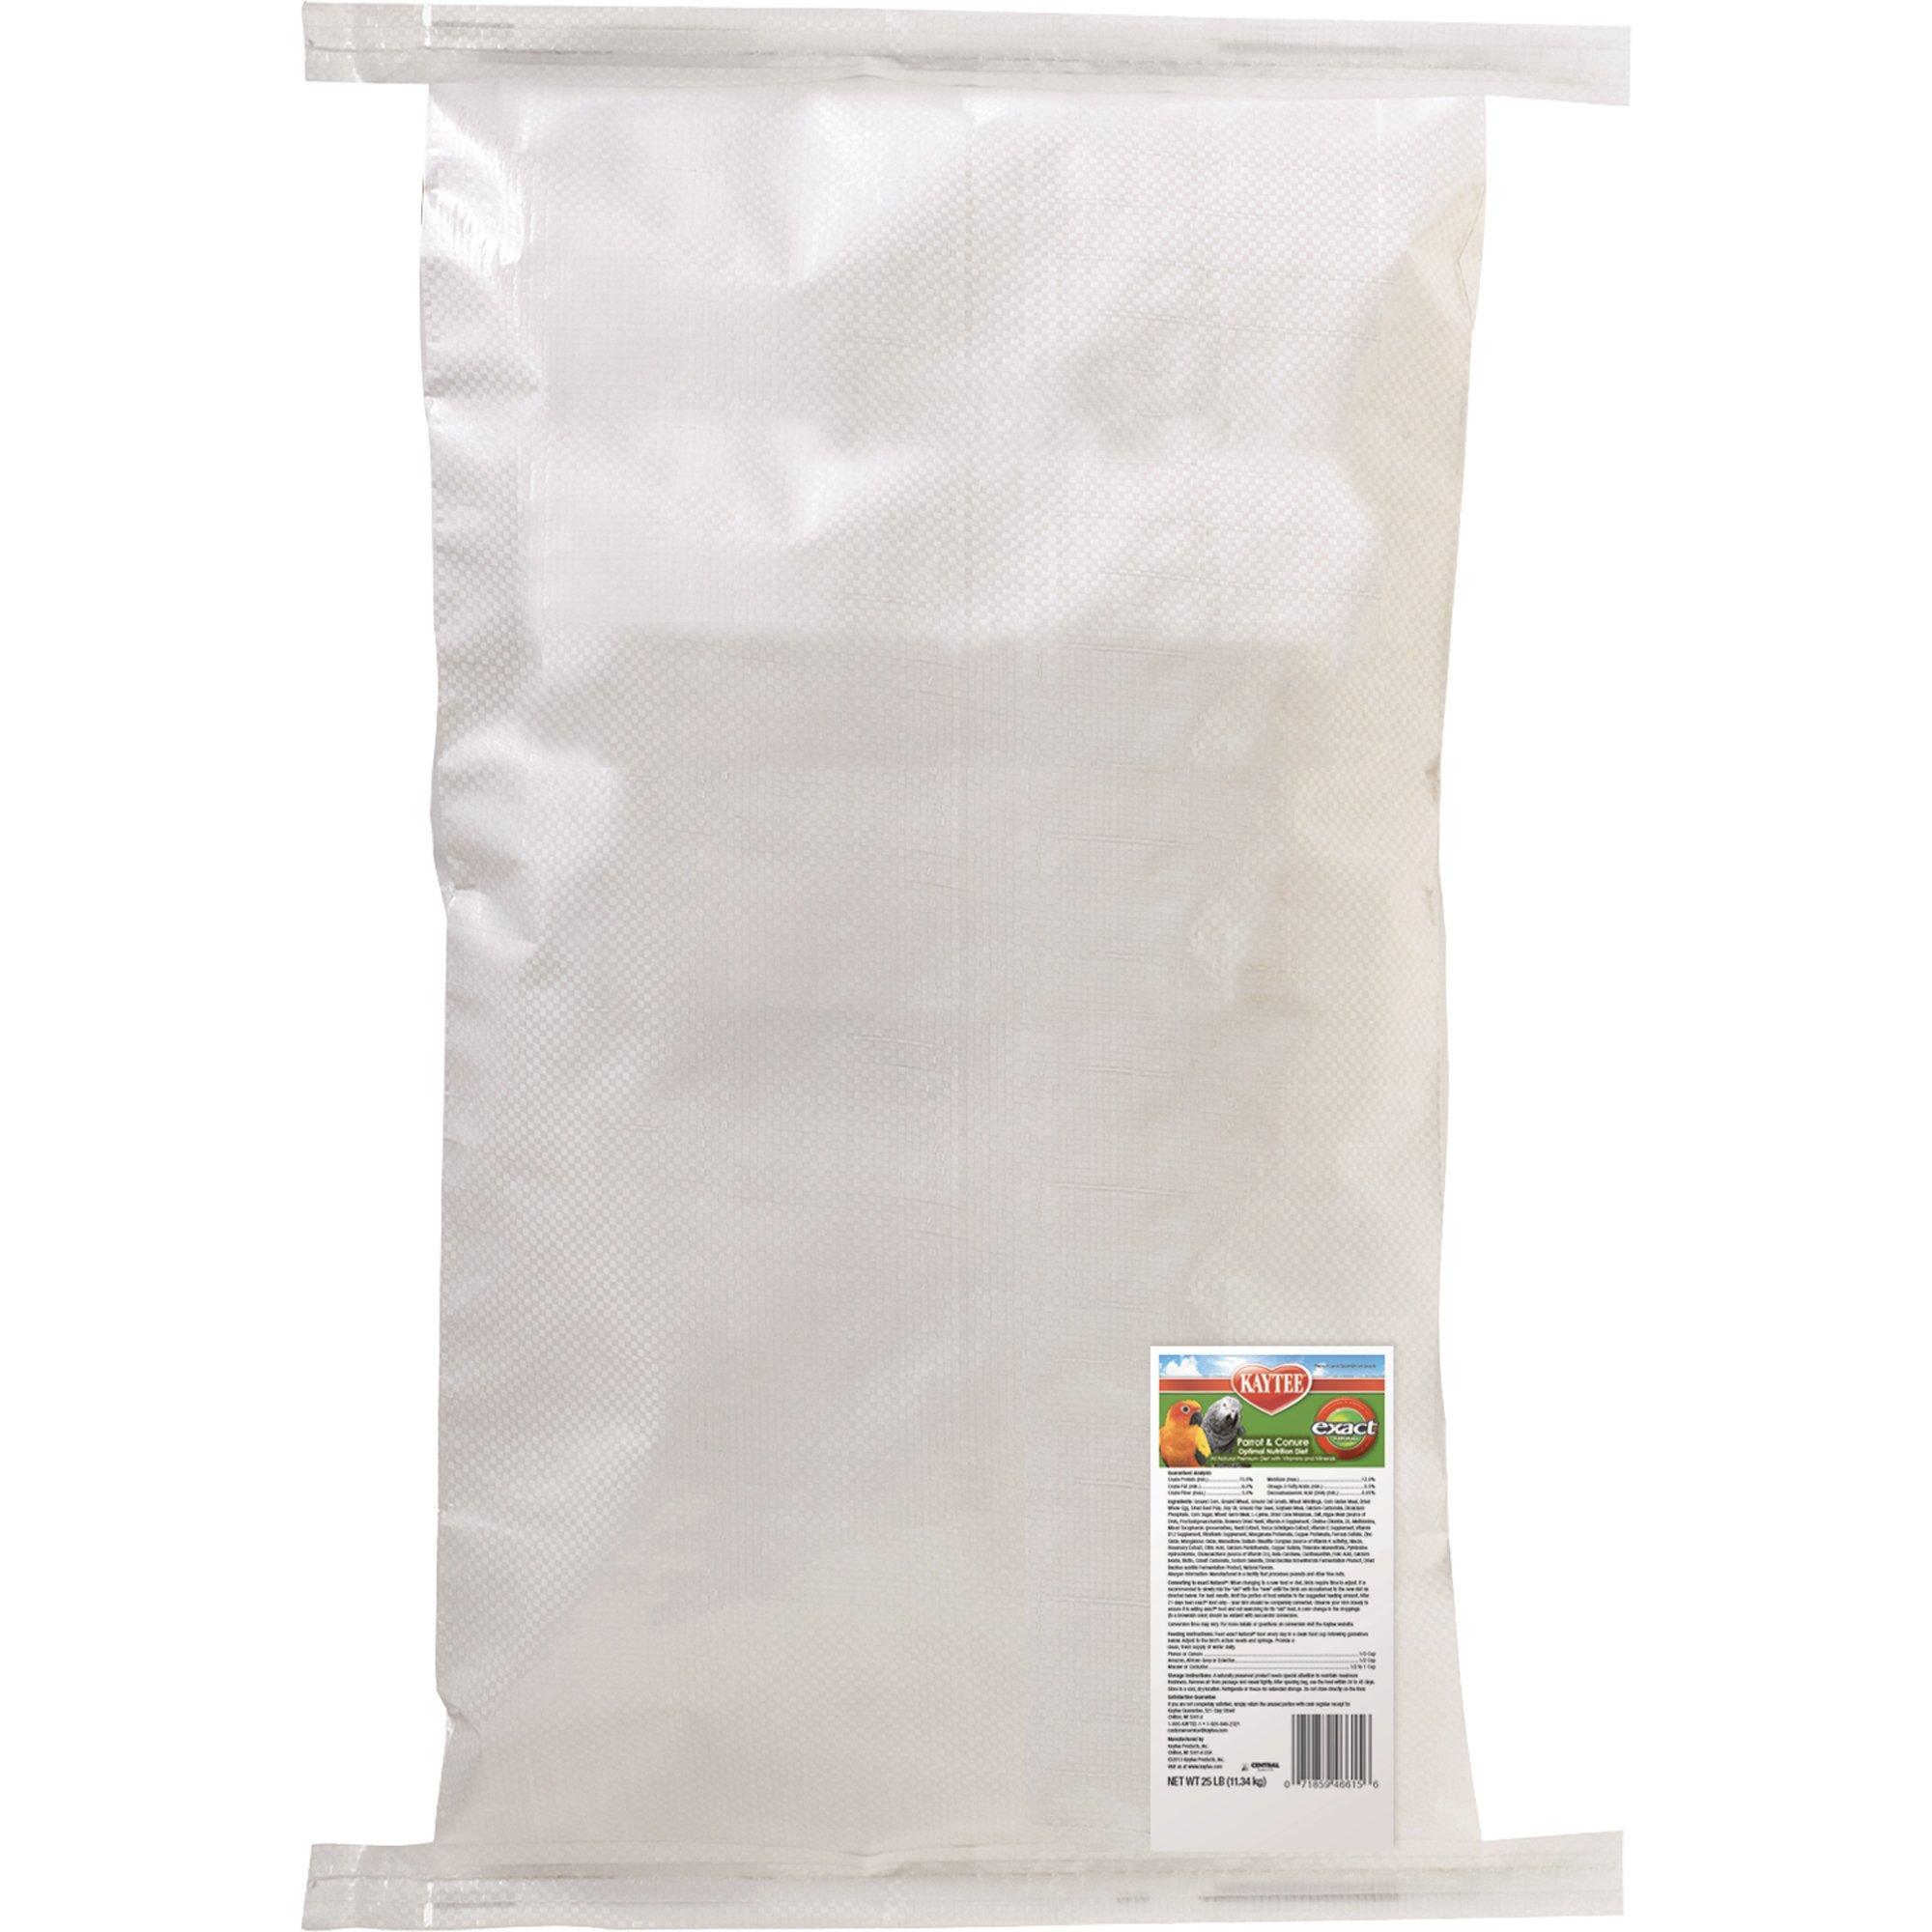 Kaytee Exact Original Premium Daily Nutrition for Parrots & Conures